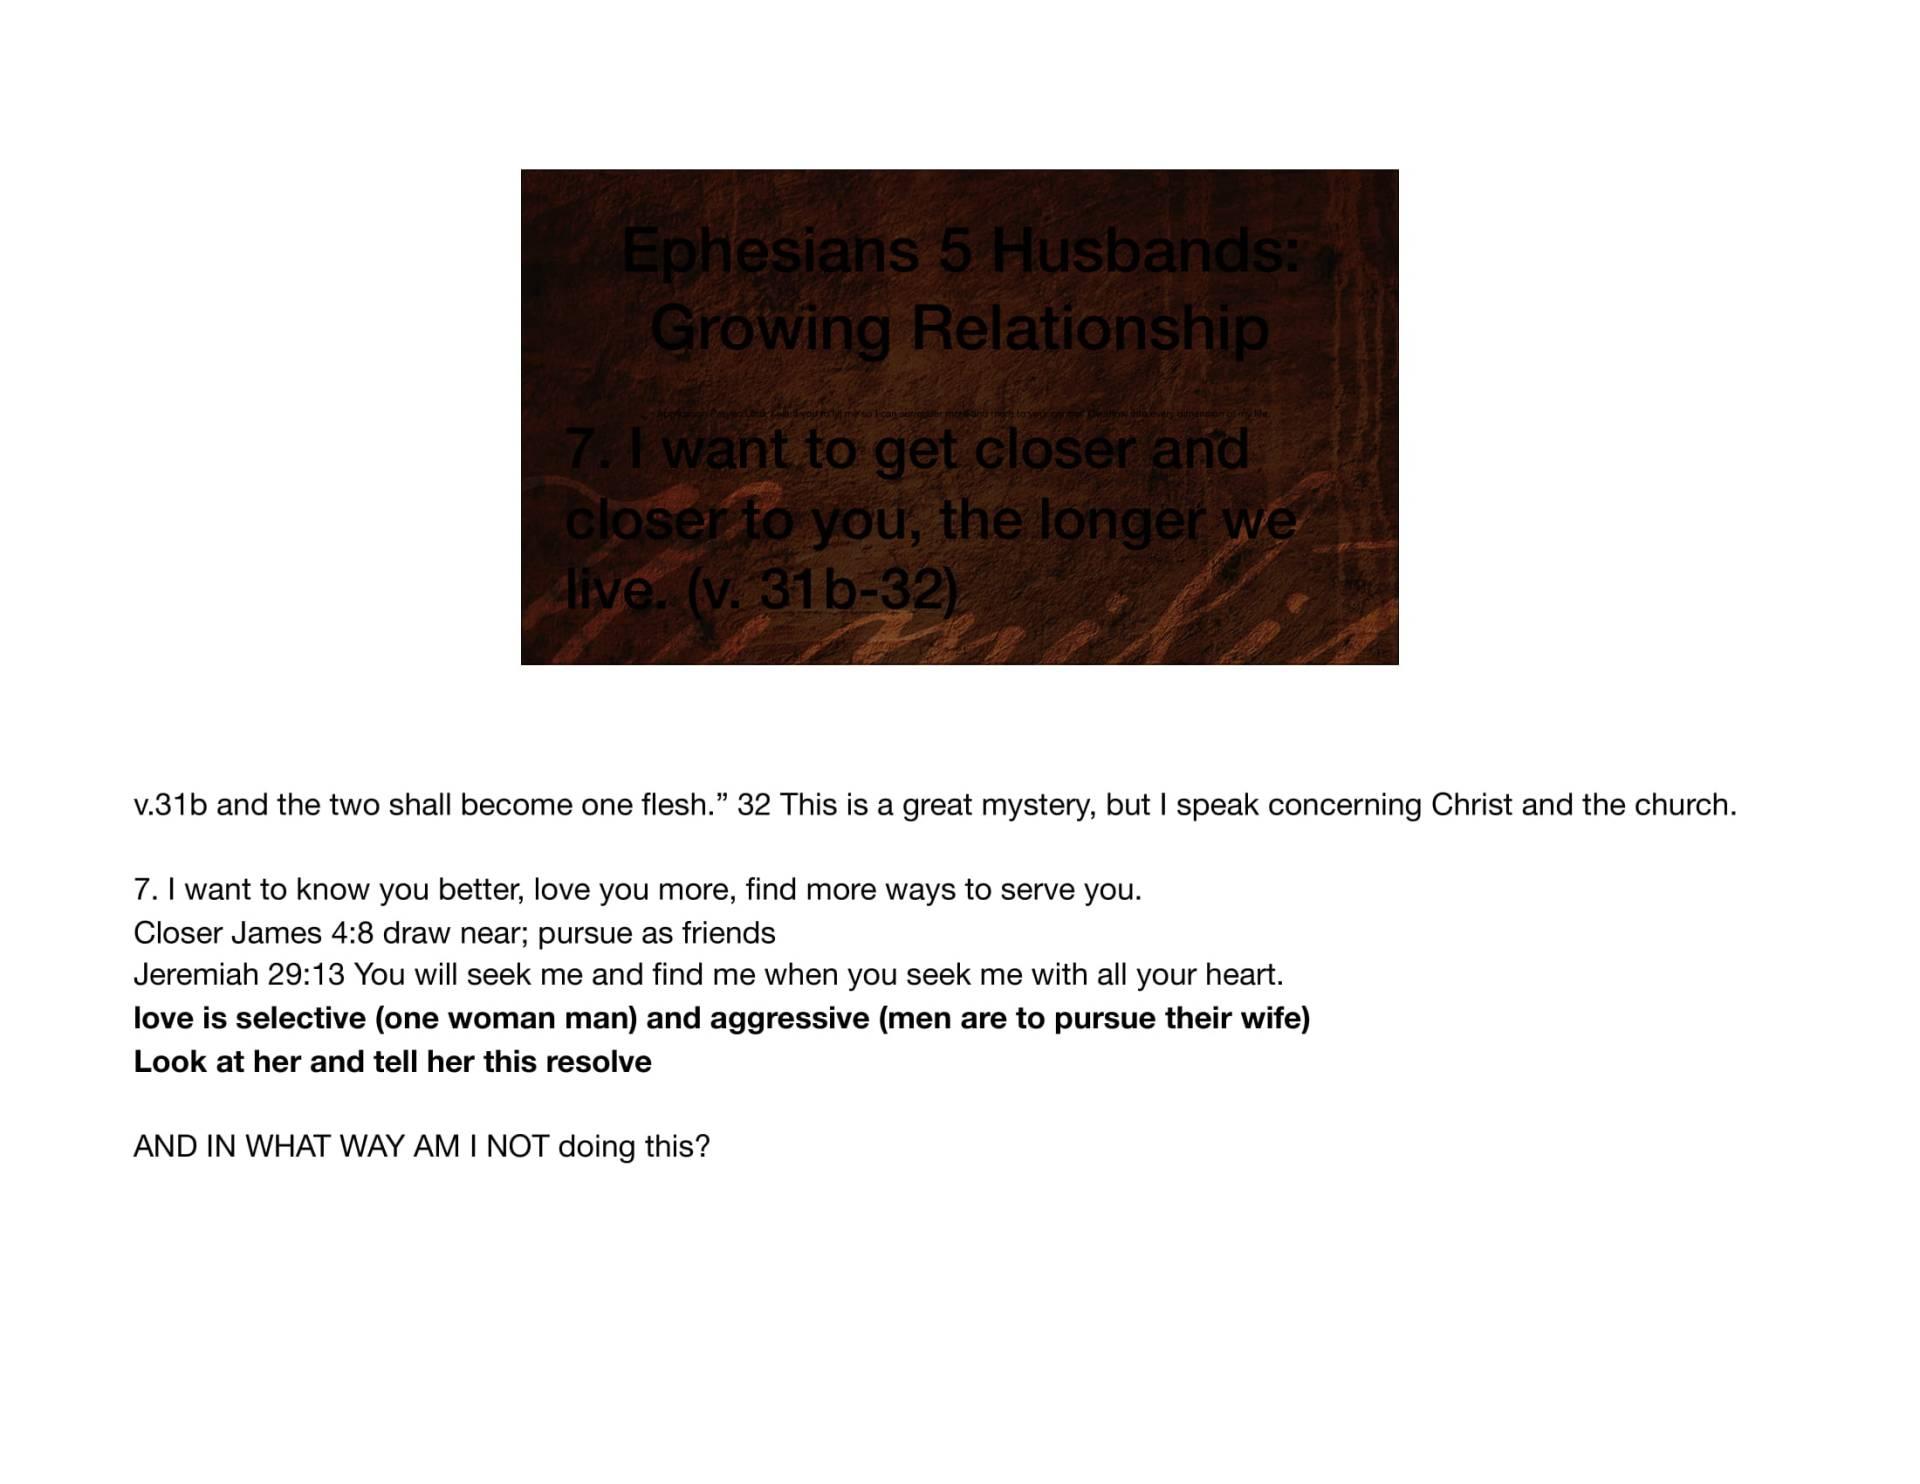 LGI-04 - Caution Men - Spiritual Maturity Is Not Automatic-21